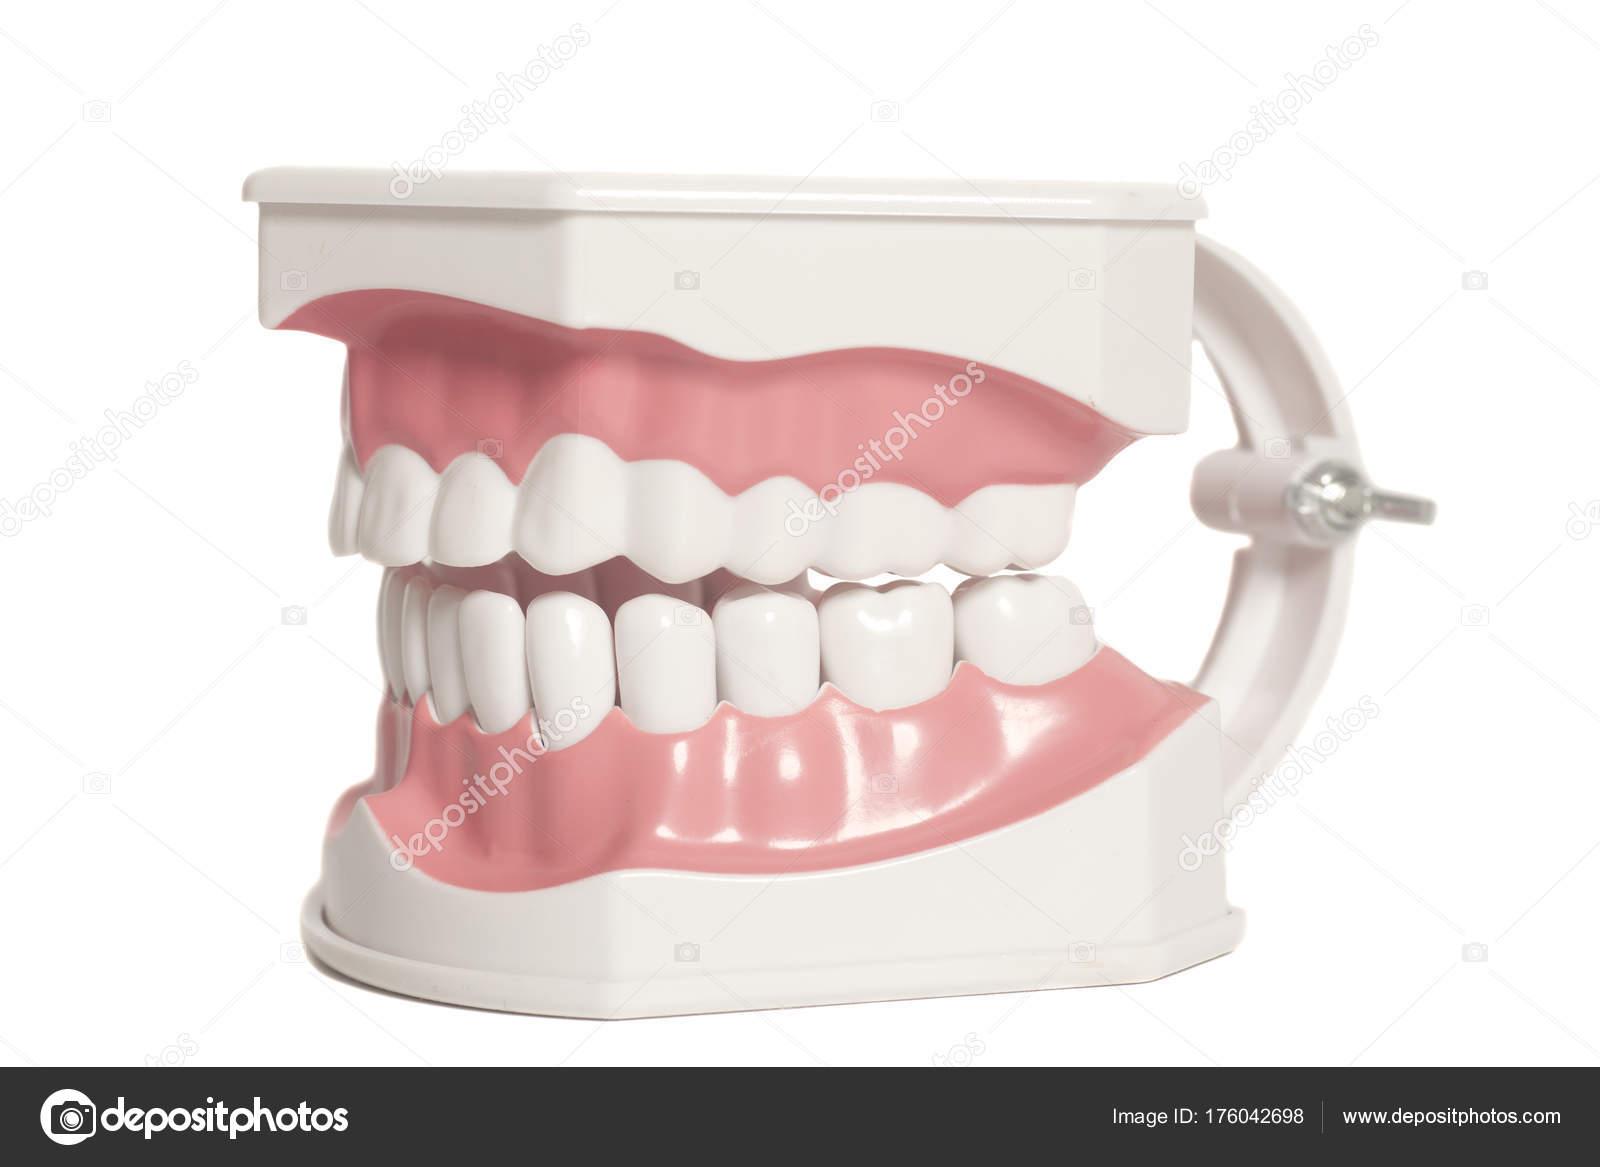 Modelo dental dientes humanos — Foto de stock © yurchello_108 #176042698